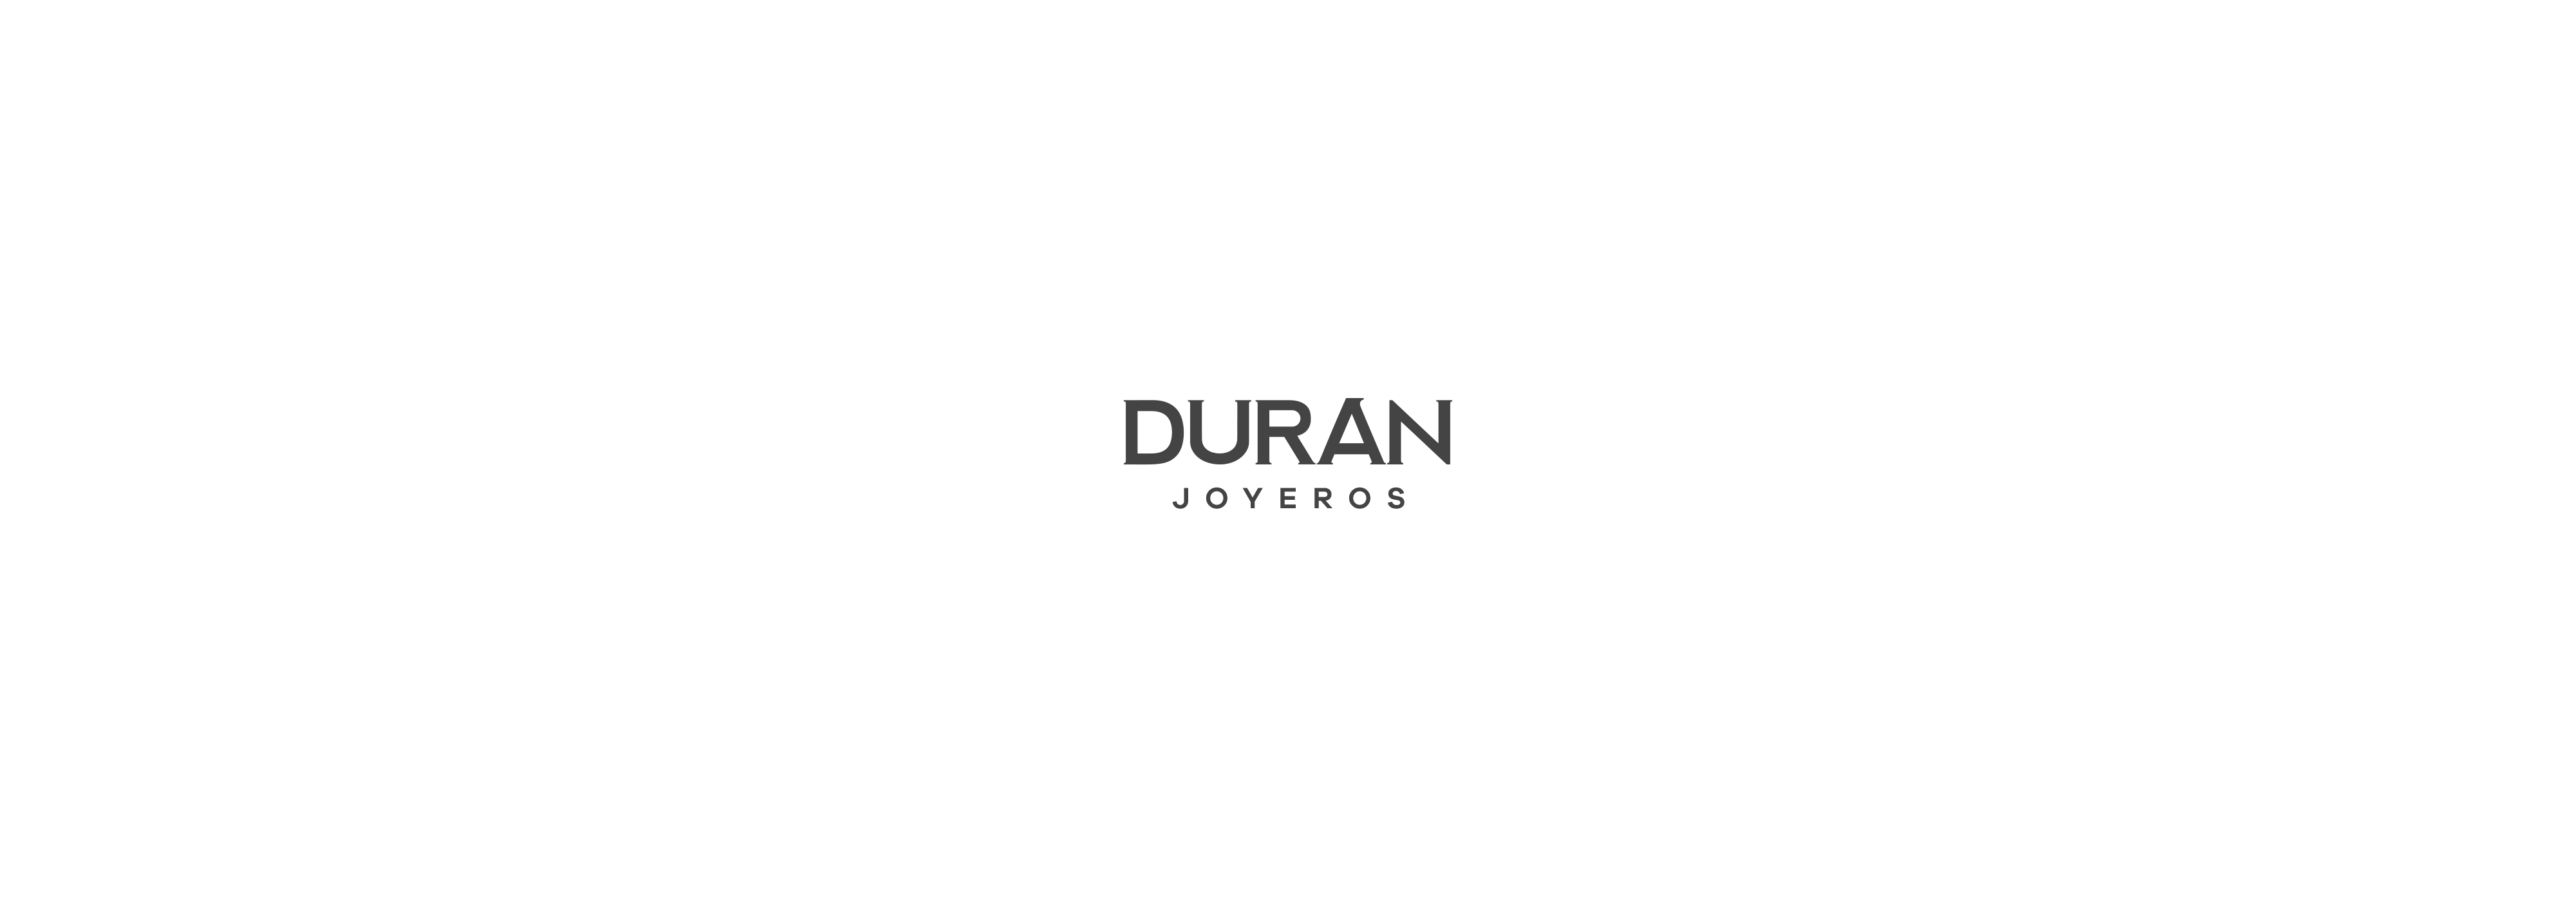 Durán Joyeros Rebranding by Branding by The Woork Co